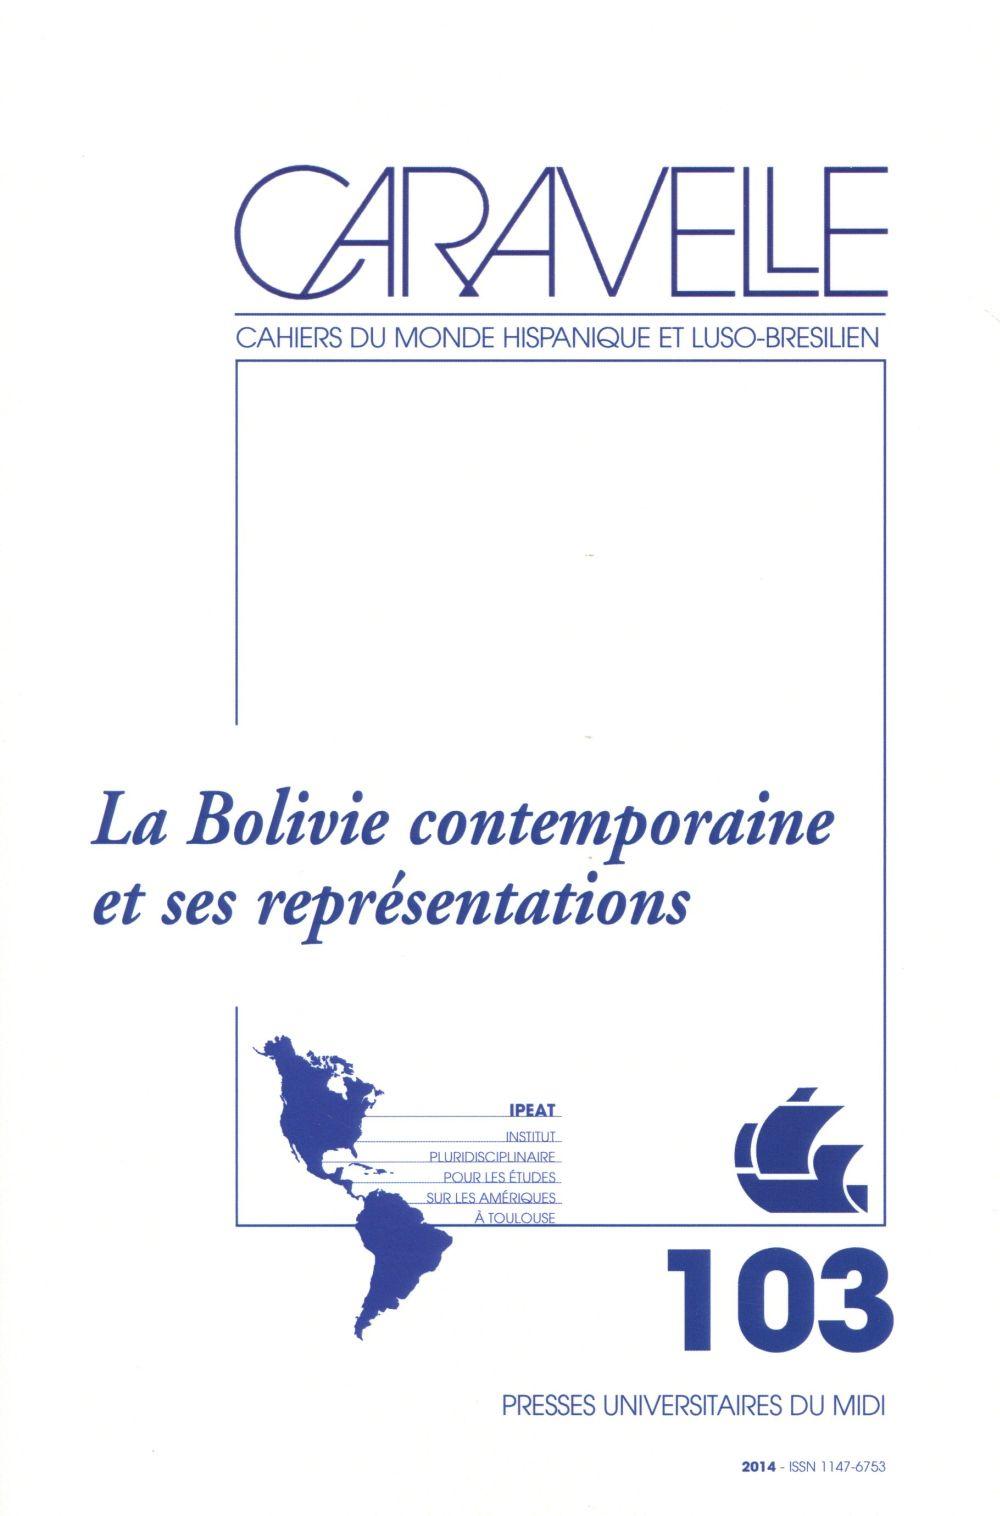 BOLIVIE CONTEMPORAINE ET SES REPRESENTATIONS